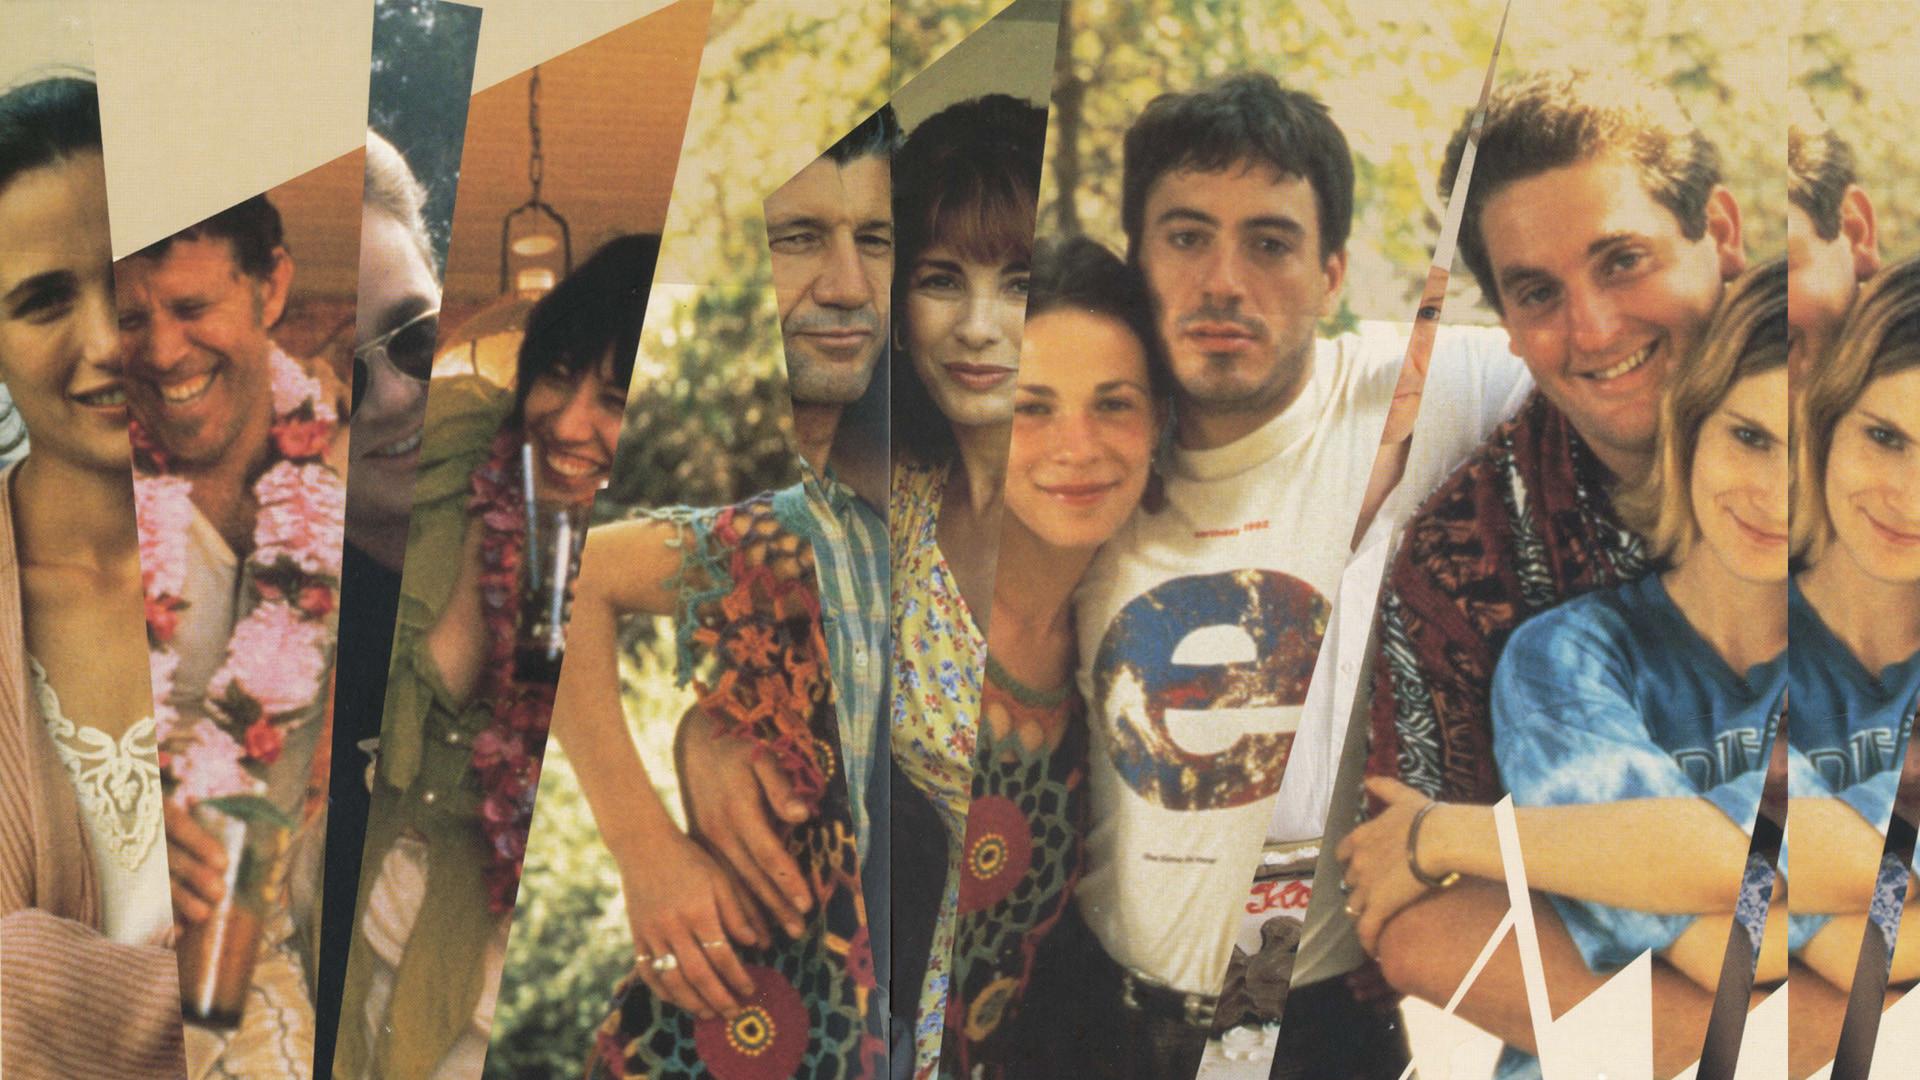 LA films-Short Cuts-Us of America magazine.jpg